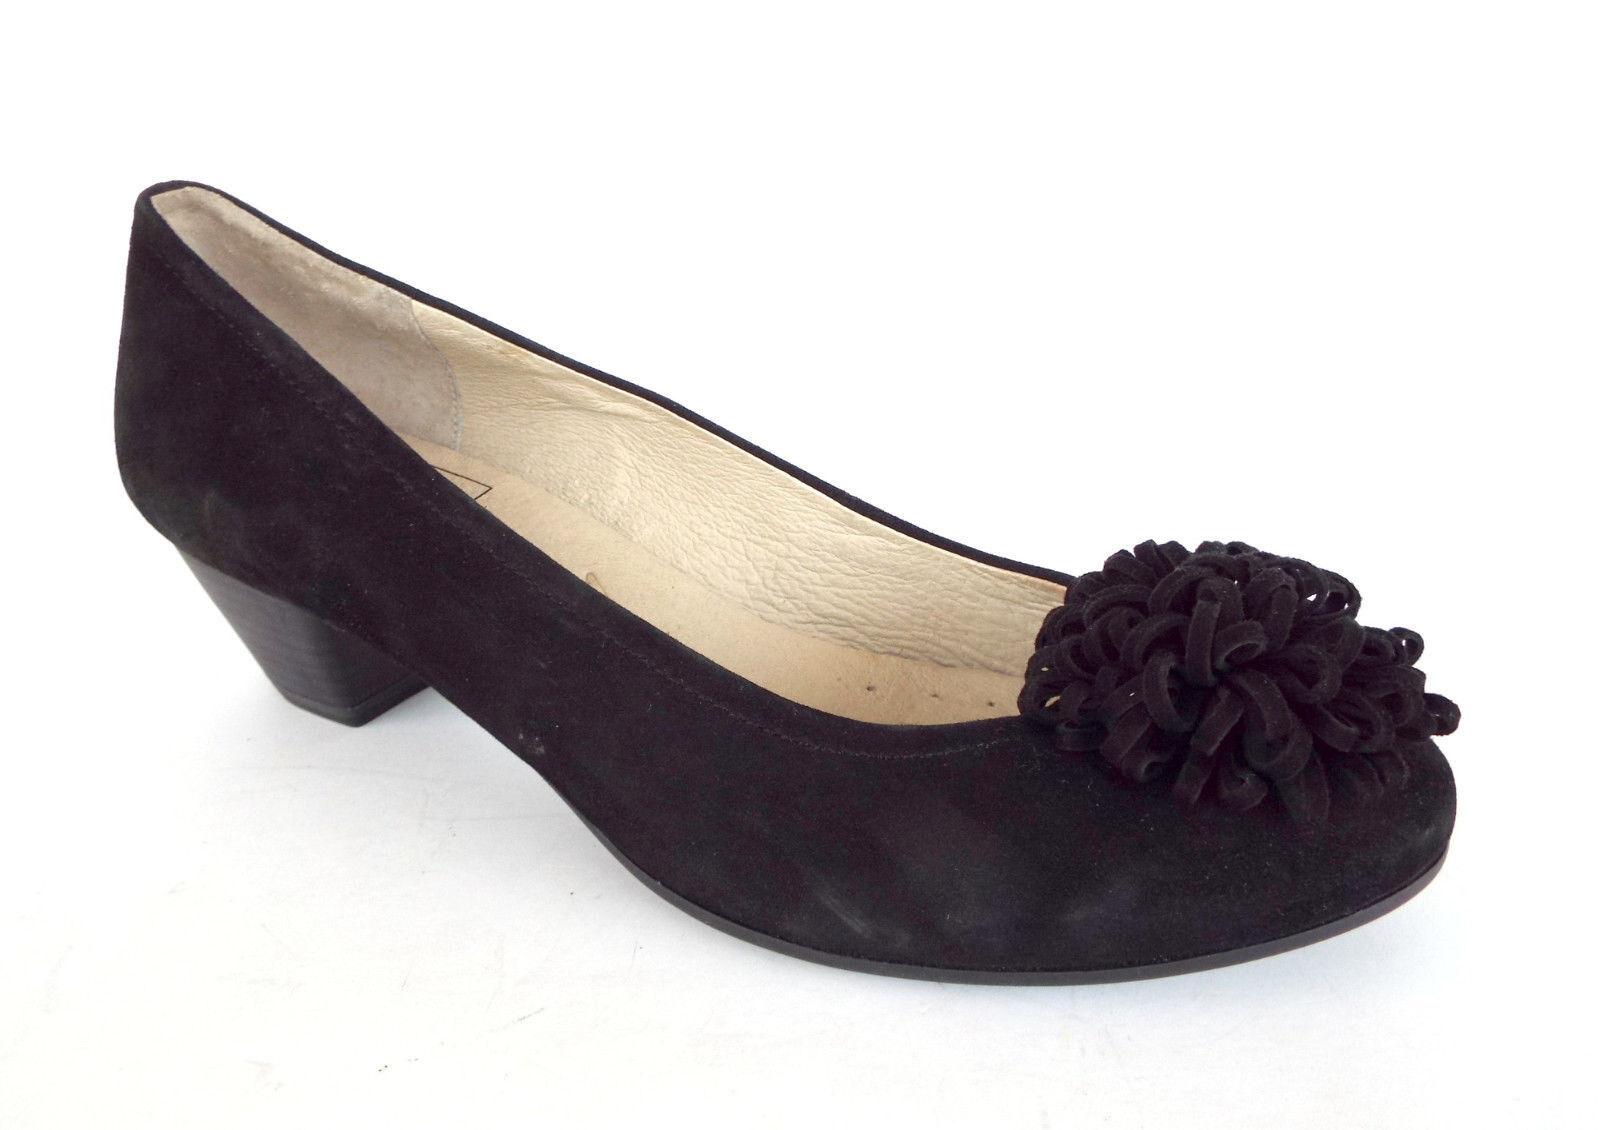 New CAPRICE Size 7 Black Heels Suede Pom Pom Heels Black Pumps Shoes 217951